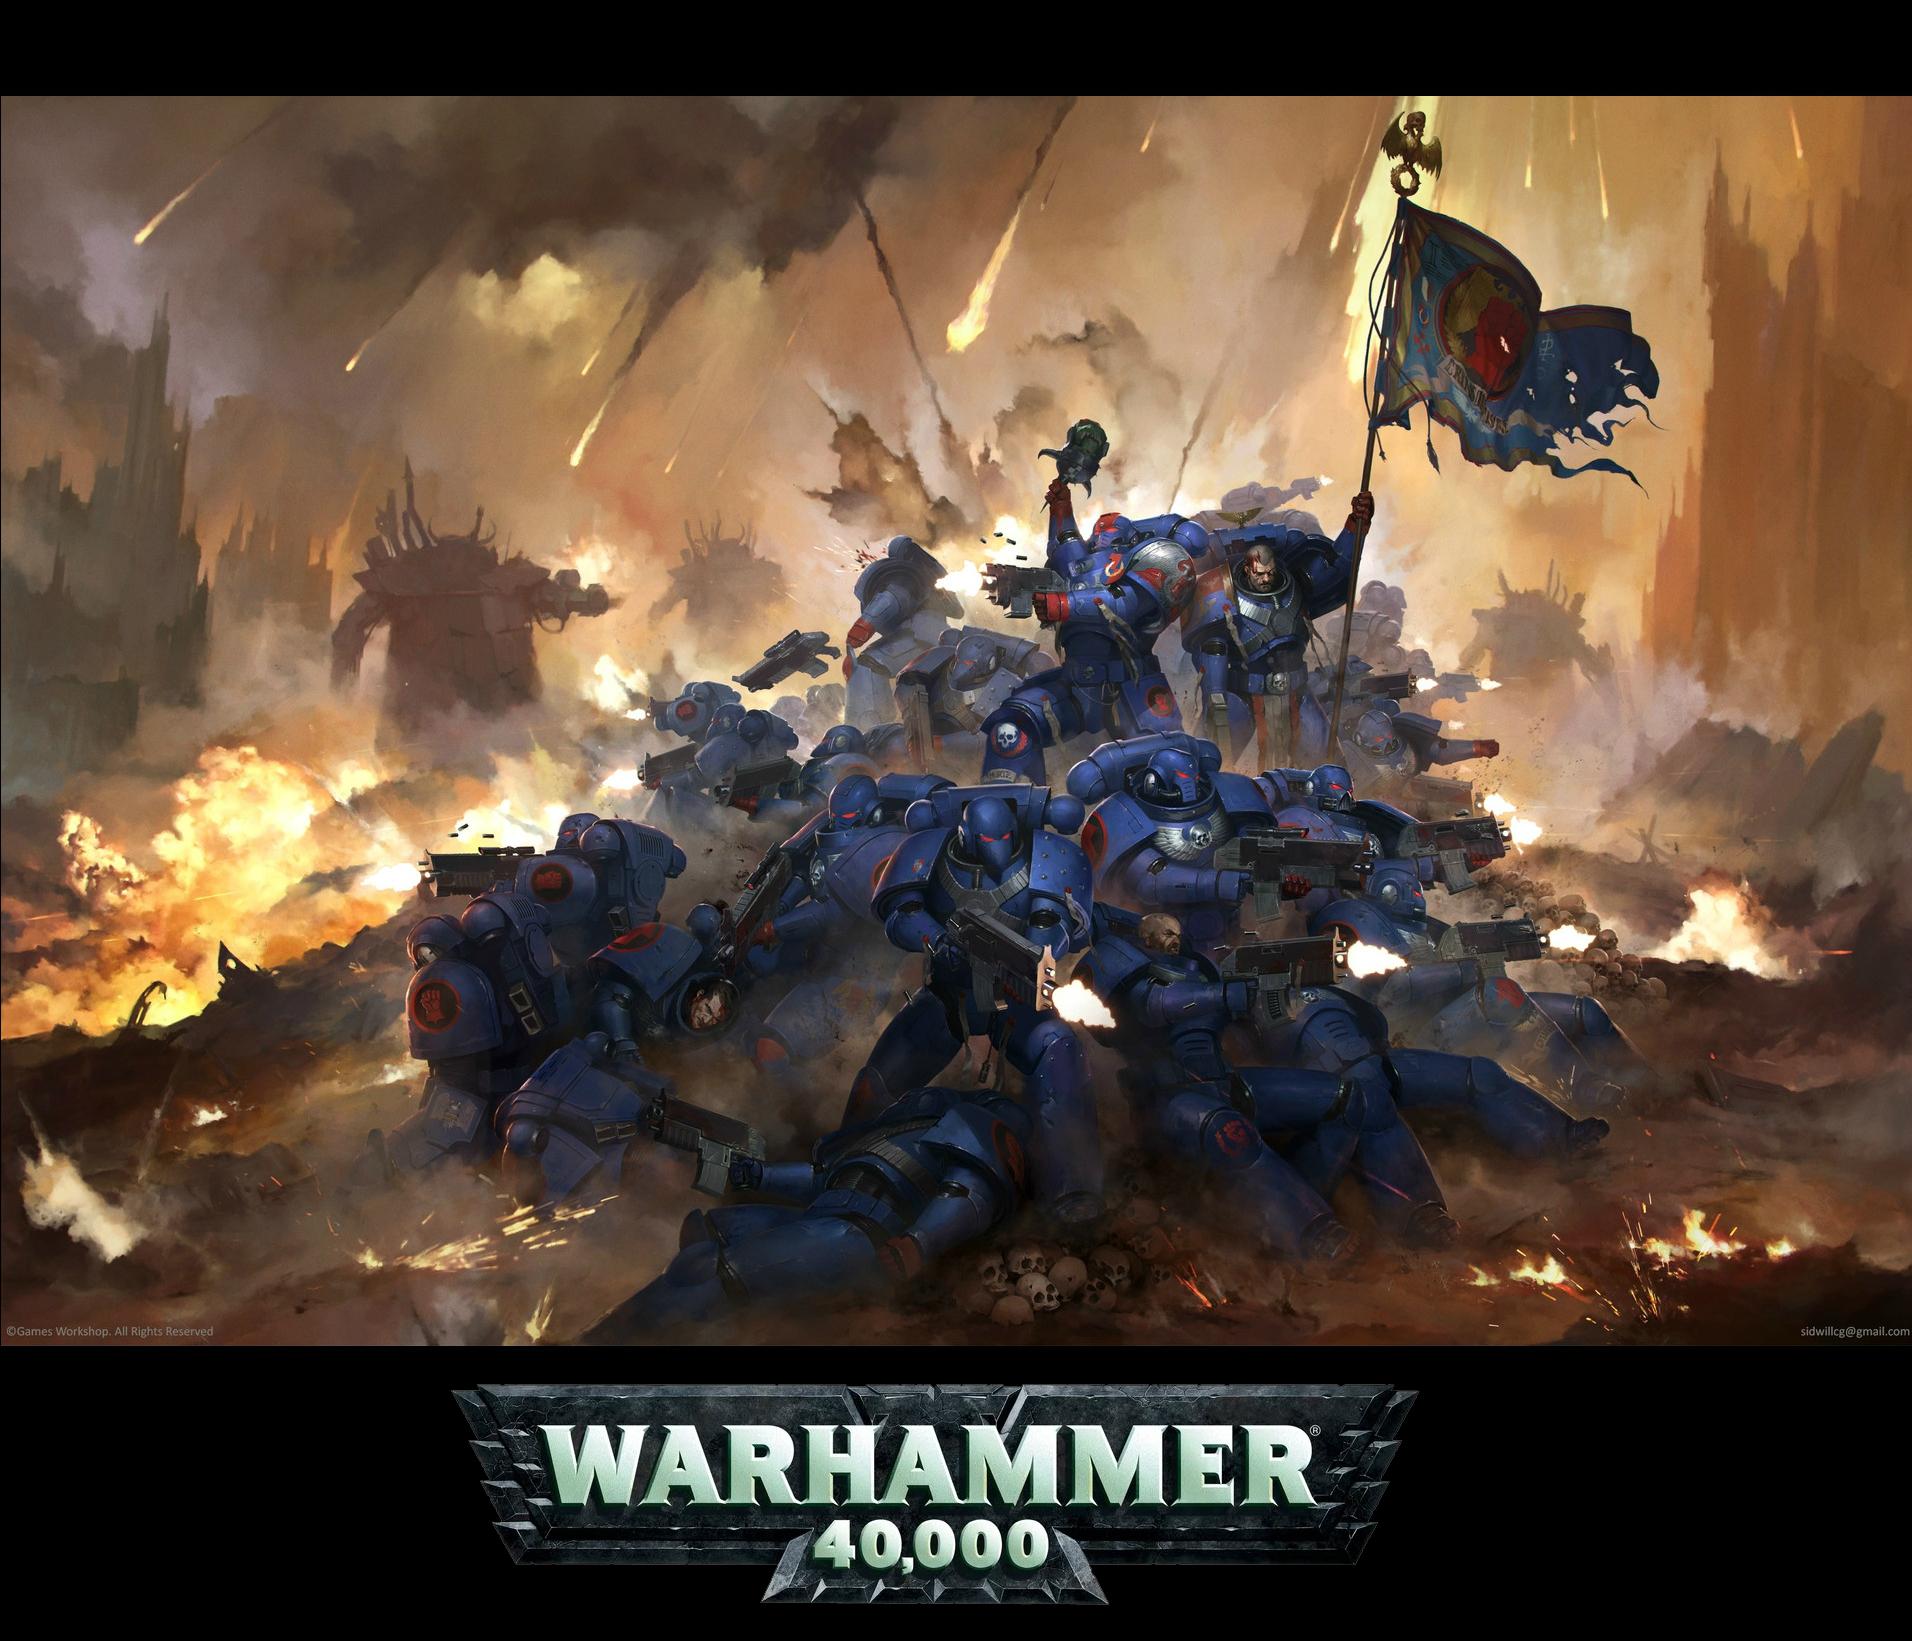 Warhammer 40,000 | VS Battles Wiki | FANDOM powered by Wikia